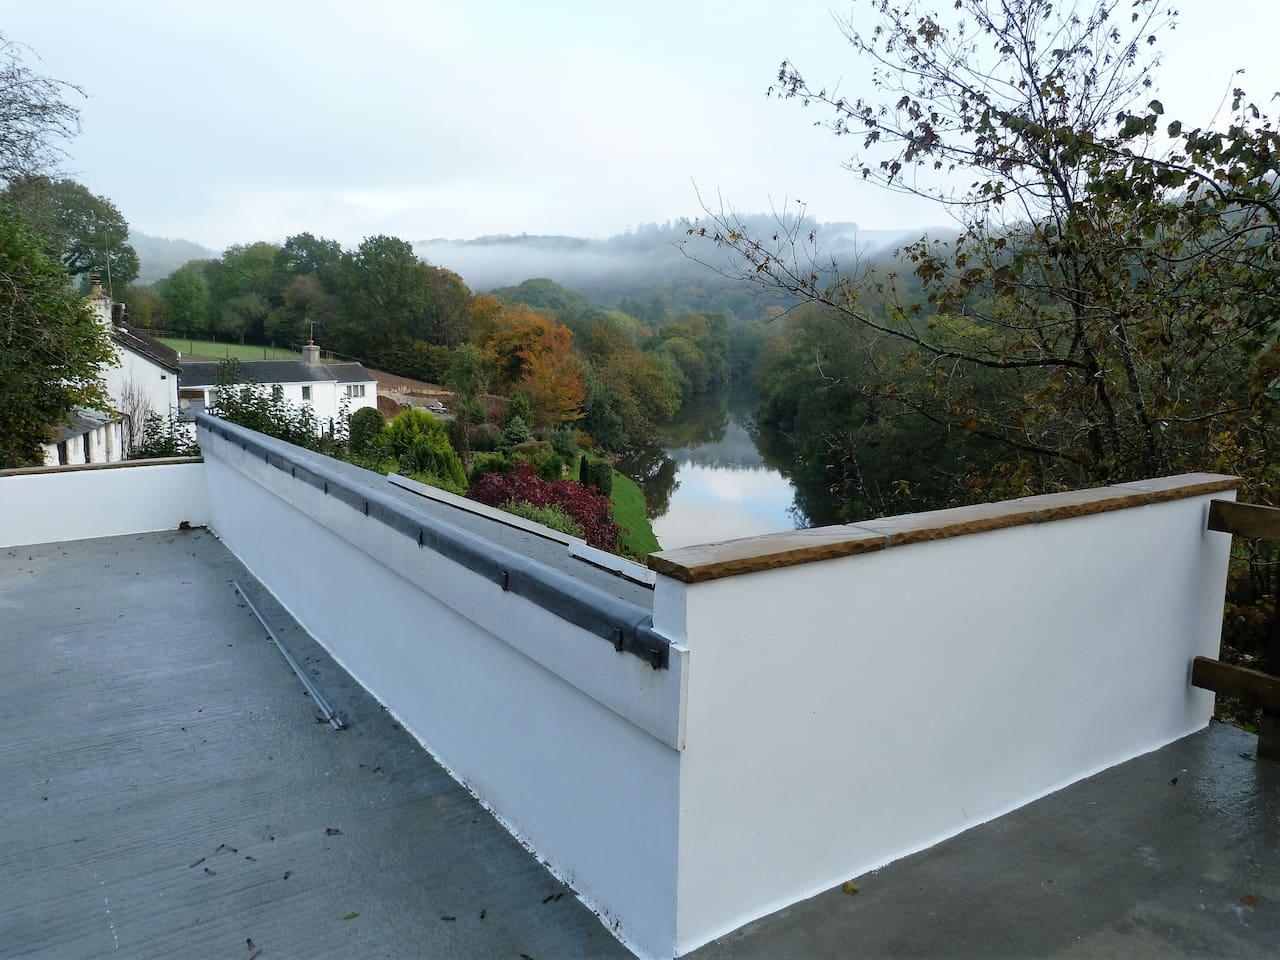 Newbridge students scale great heights - Leinster Leader